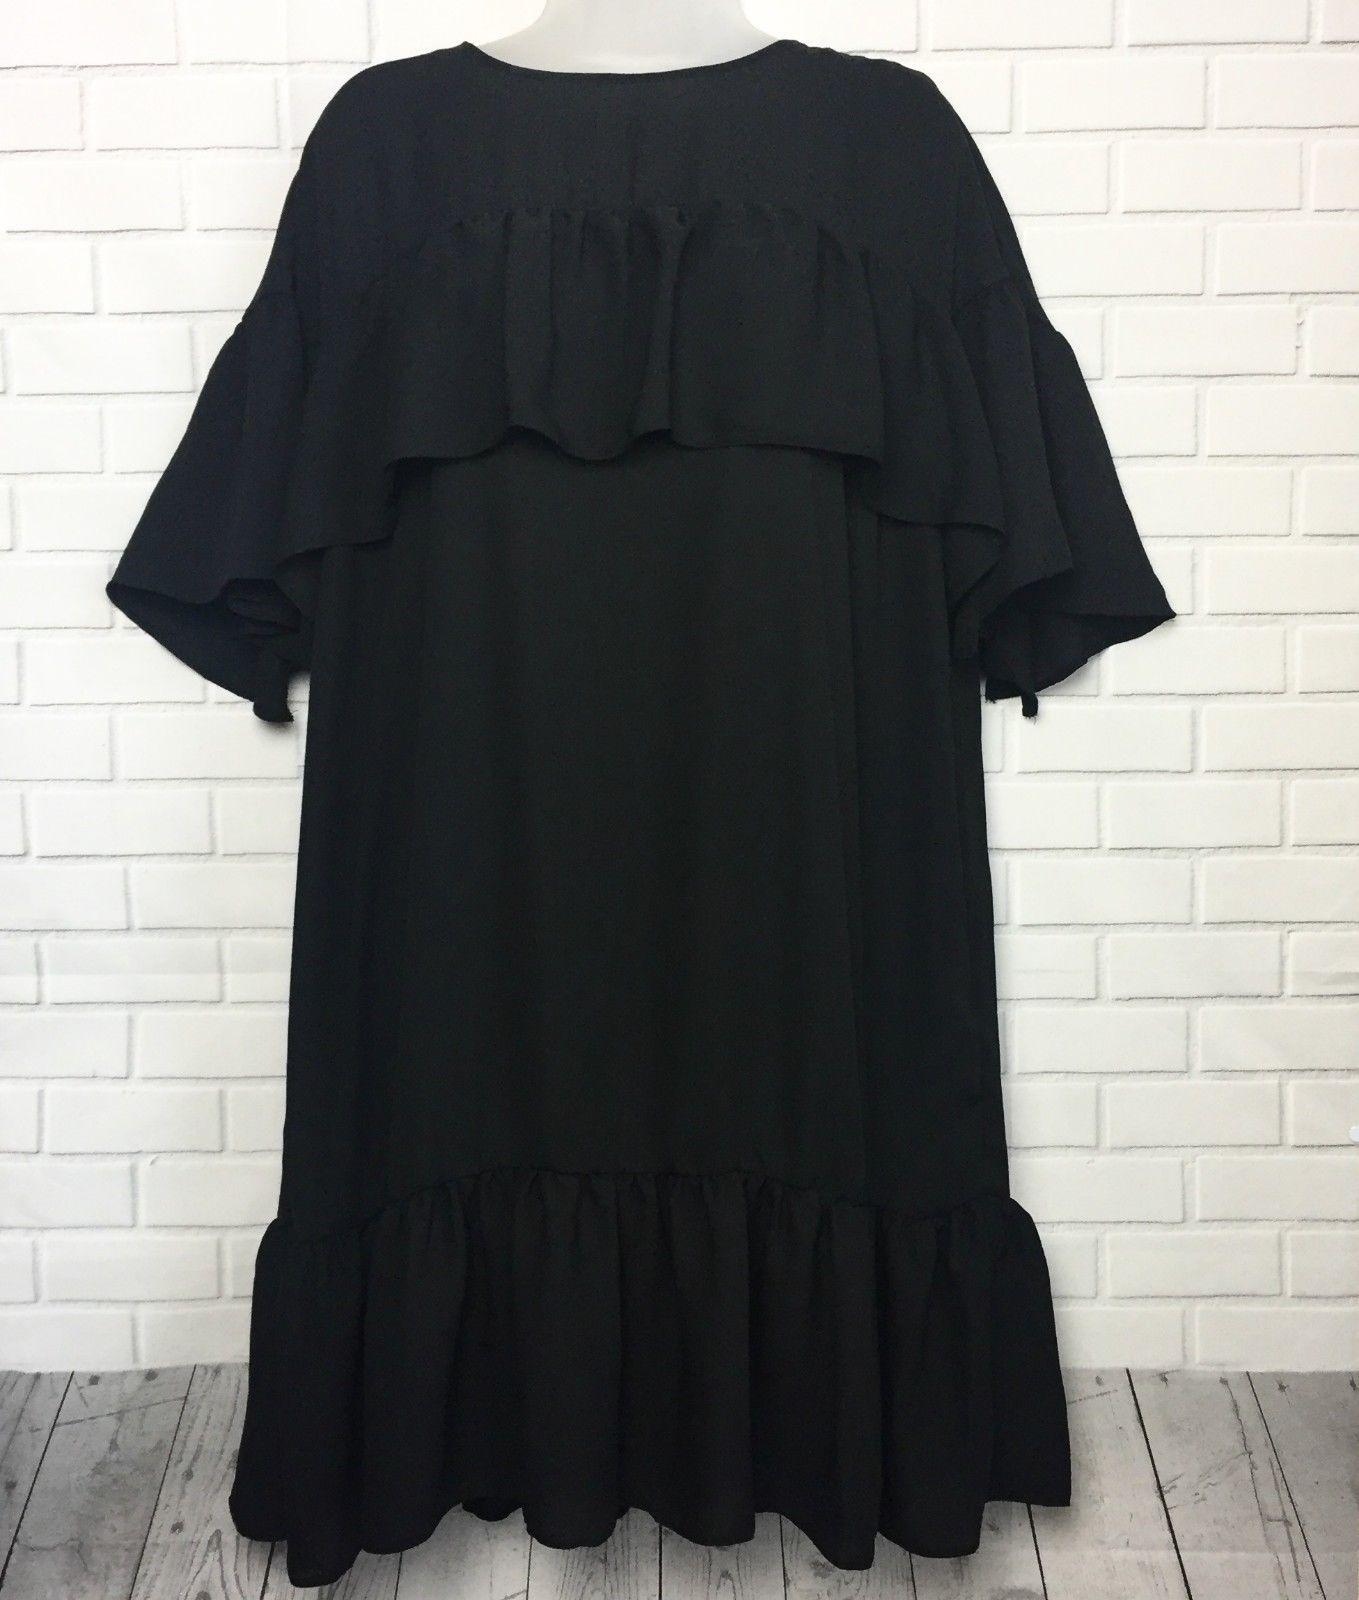 faaebaf5e1 27.95   NEW ASOS Women's Dress Size 12 Black 2-Piece Set Ruffled ...